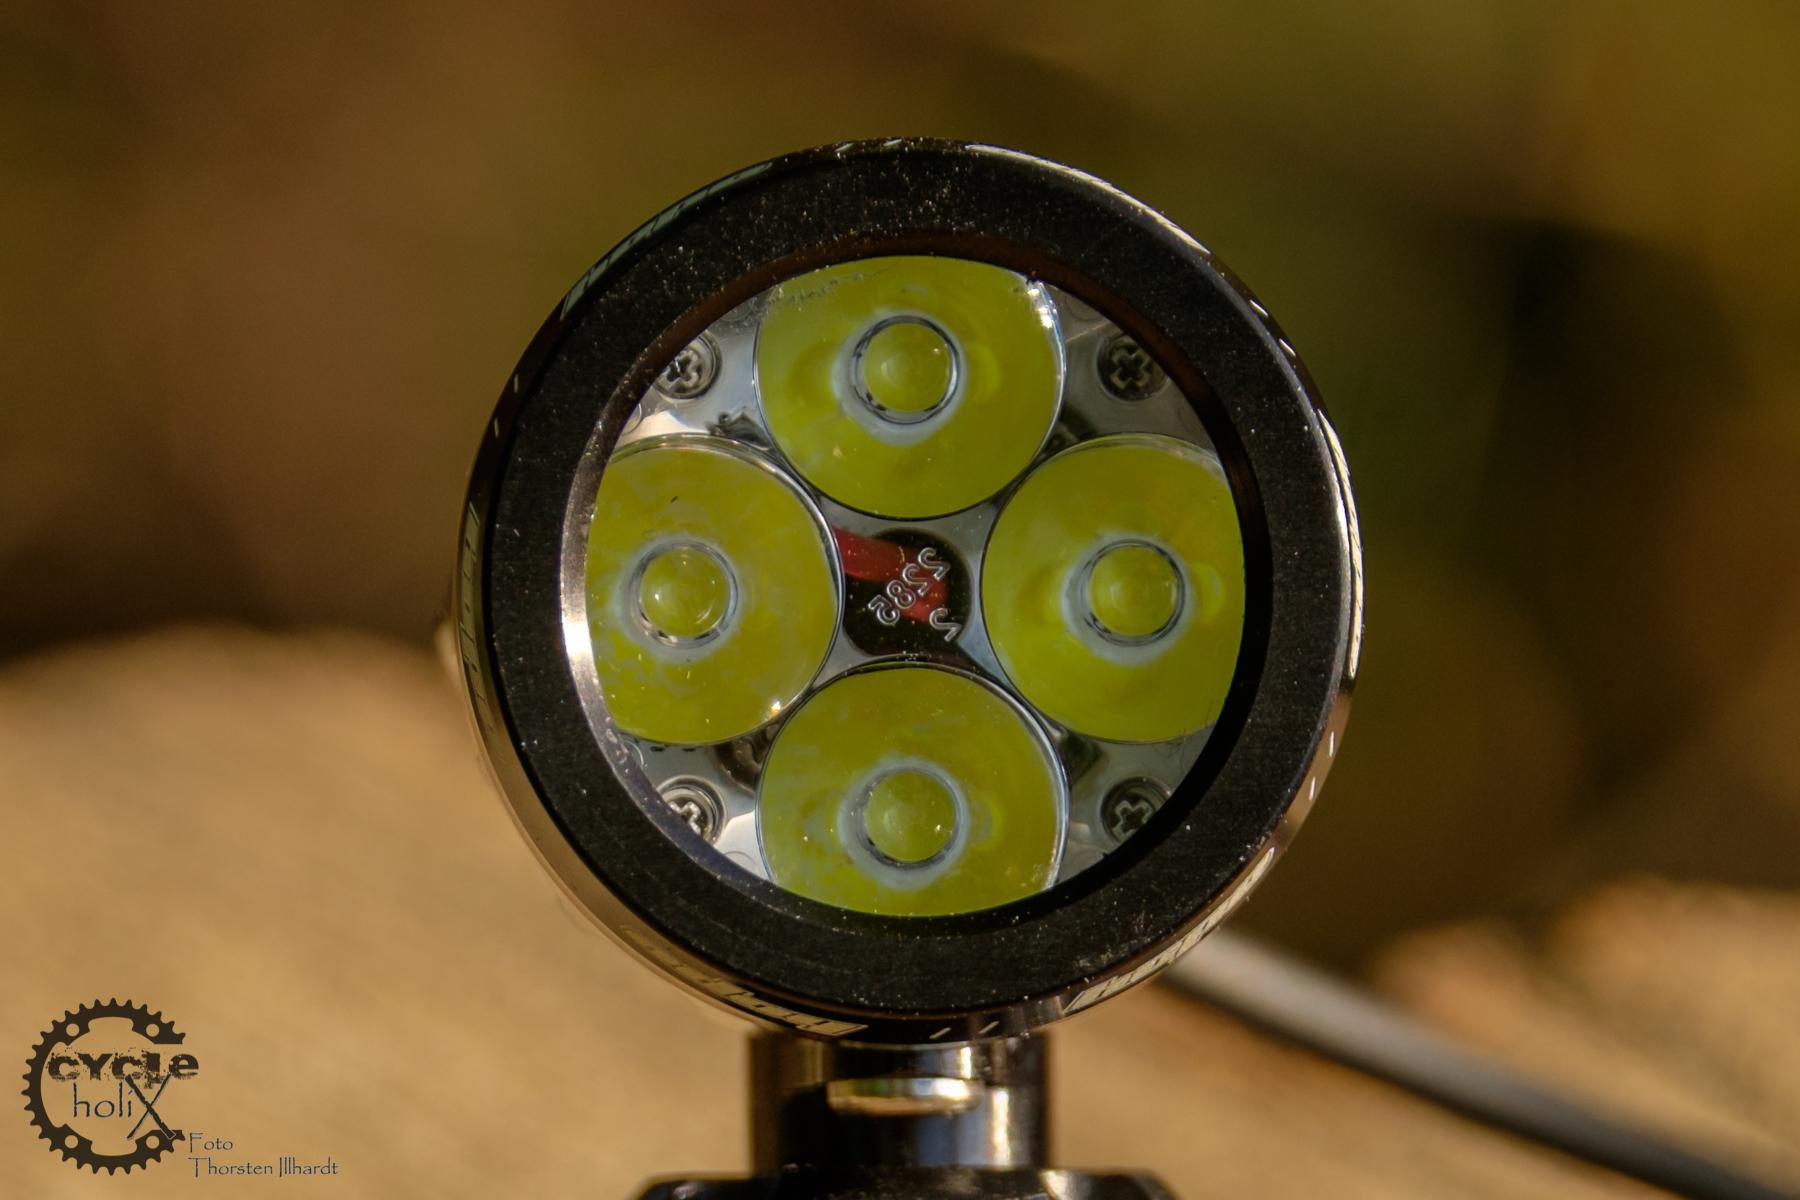 Vier Cree XM-L2 LED